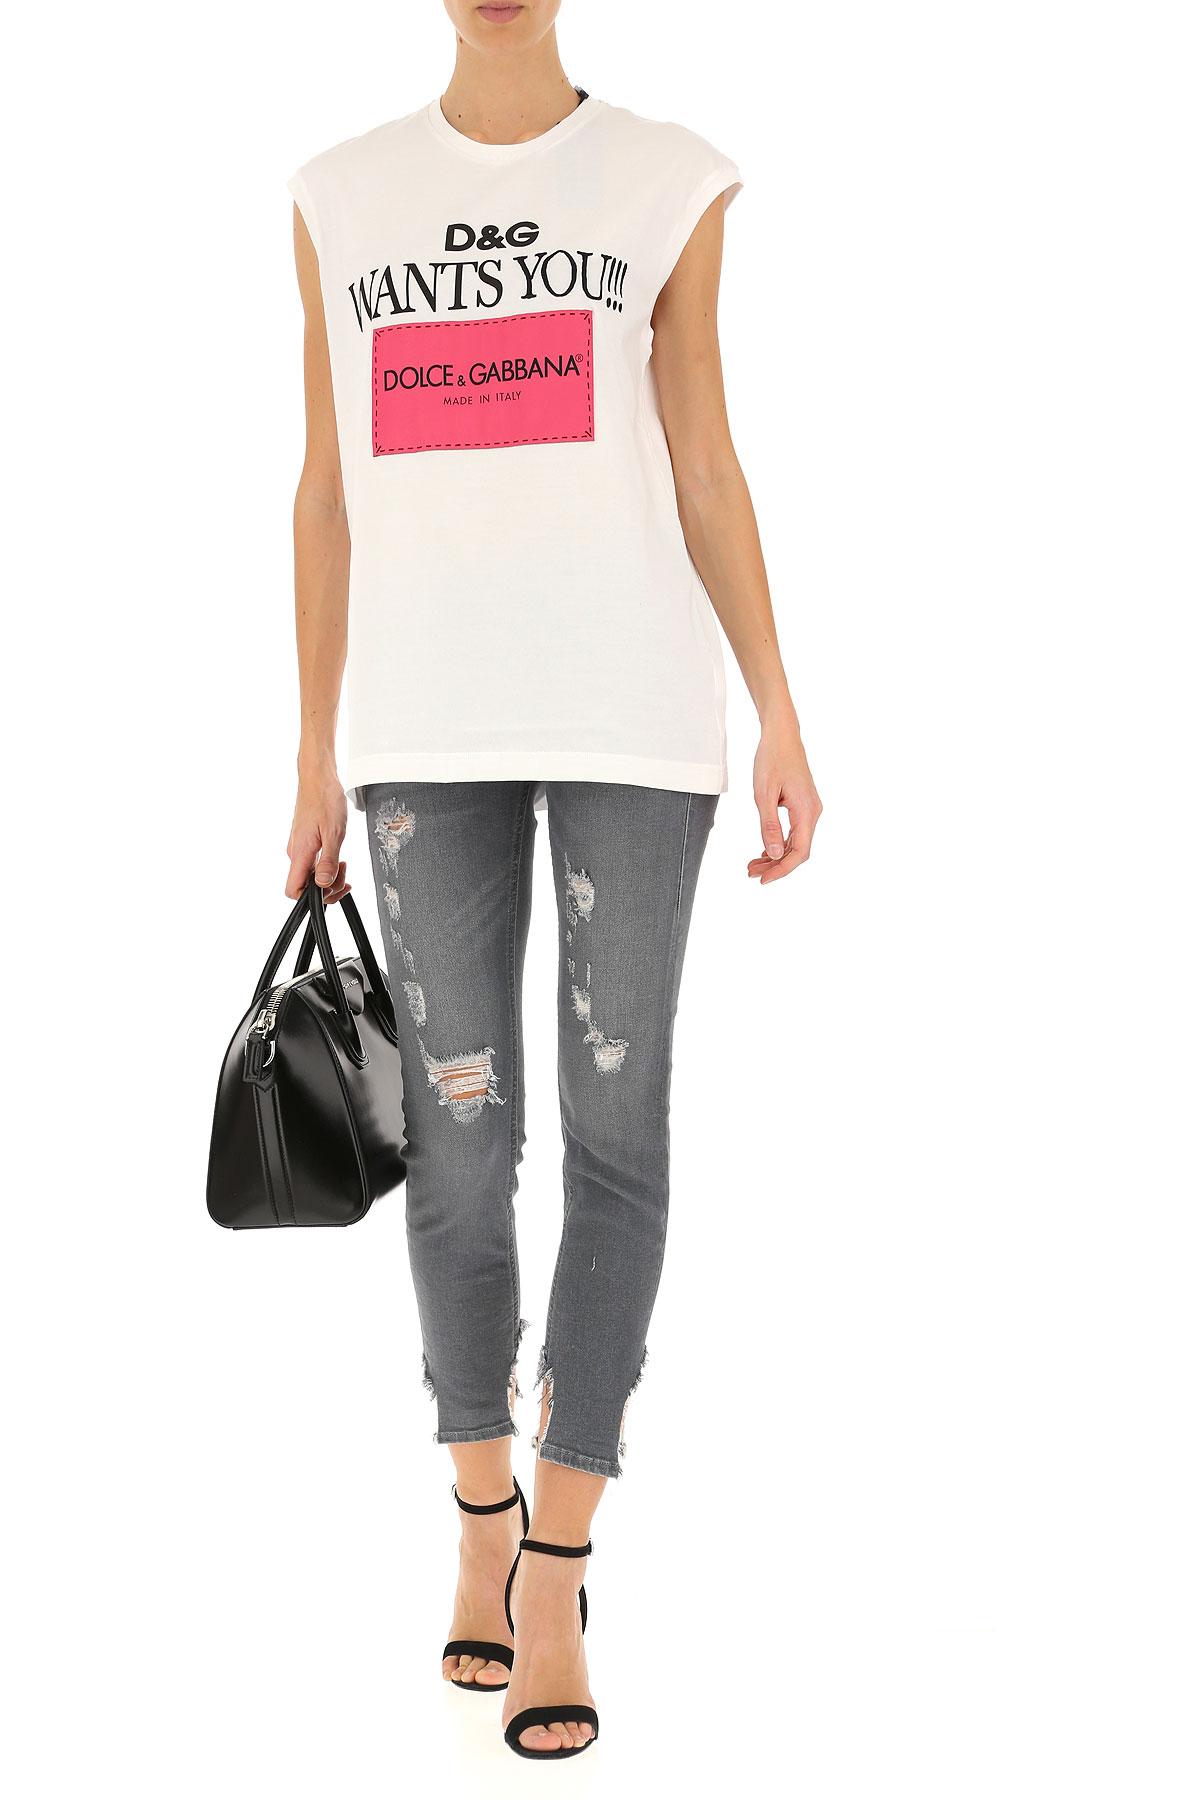 Mujer amp; Para Blanco verano Primavera Dolce nbsp;rosa 2019 Gabbana Negro Ropa qfw7PTx